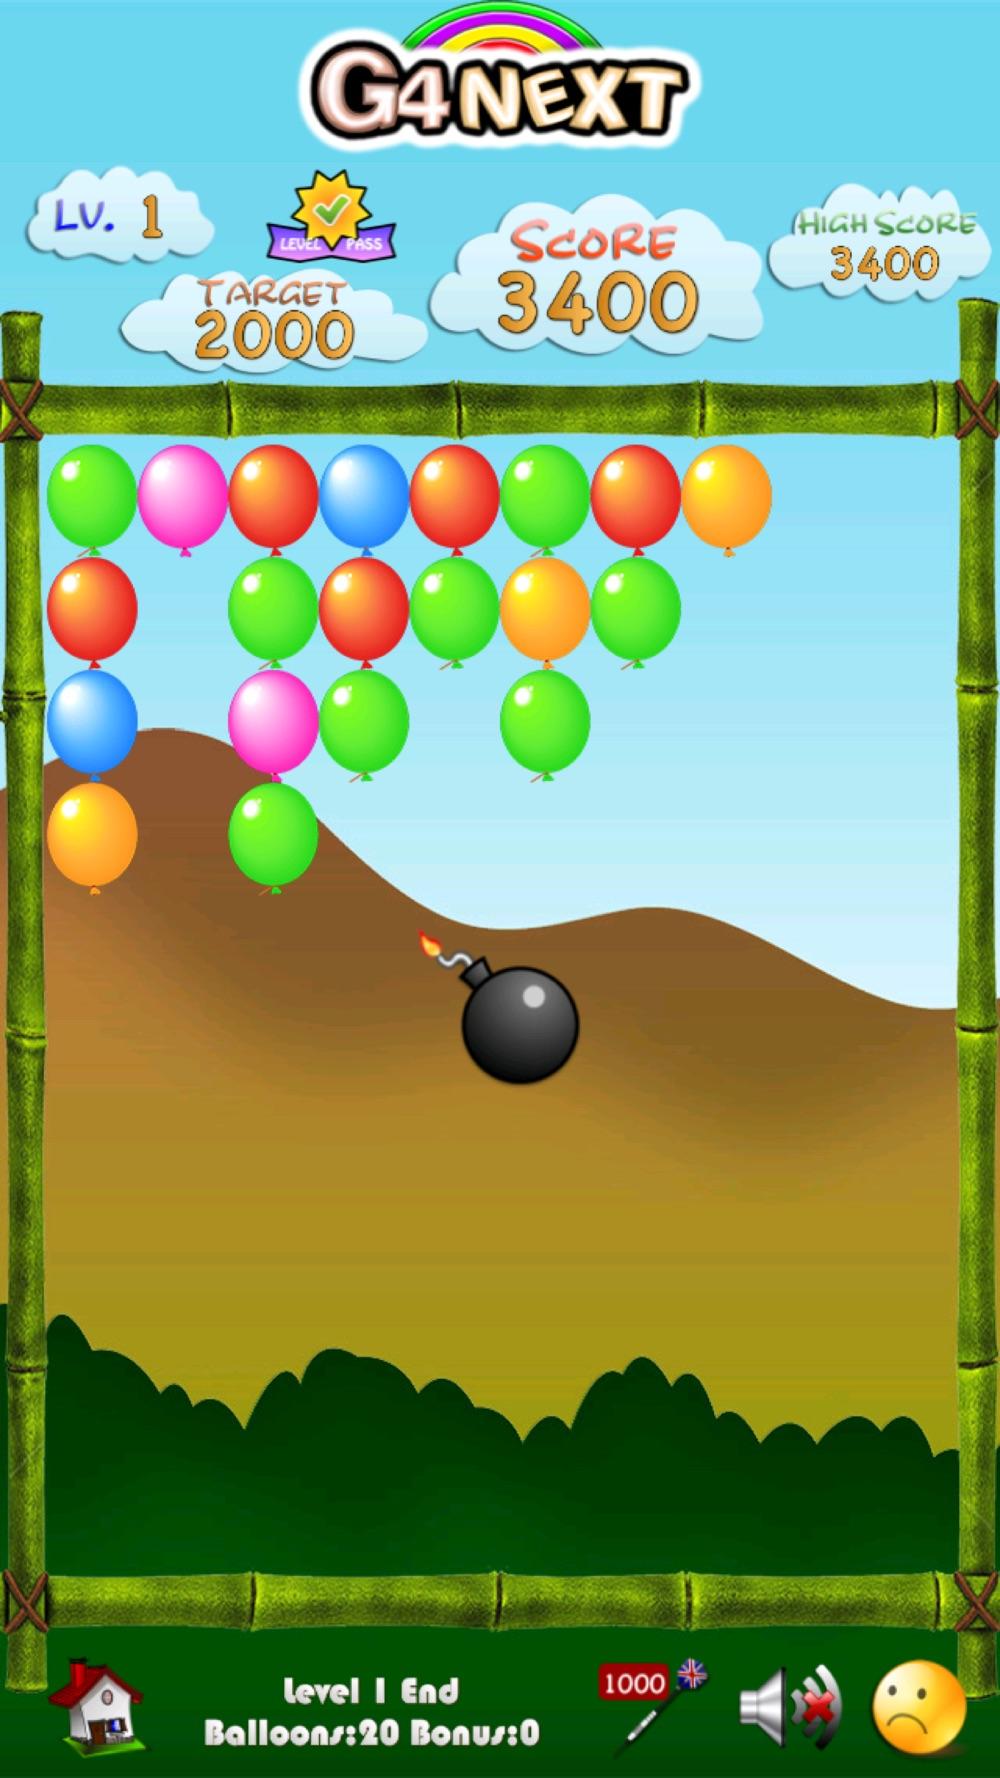 Bomb Balloons! Cheat Codes